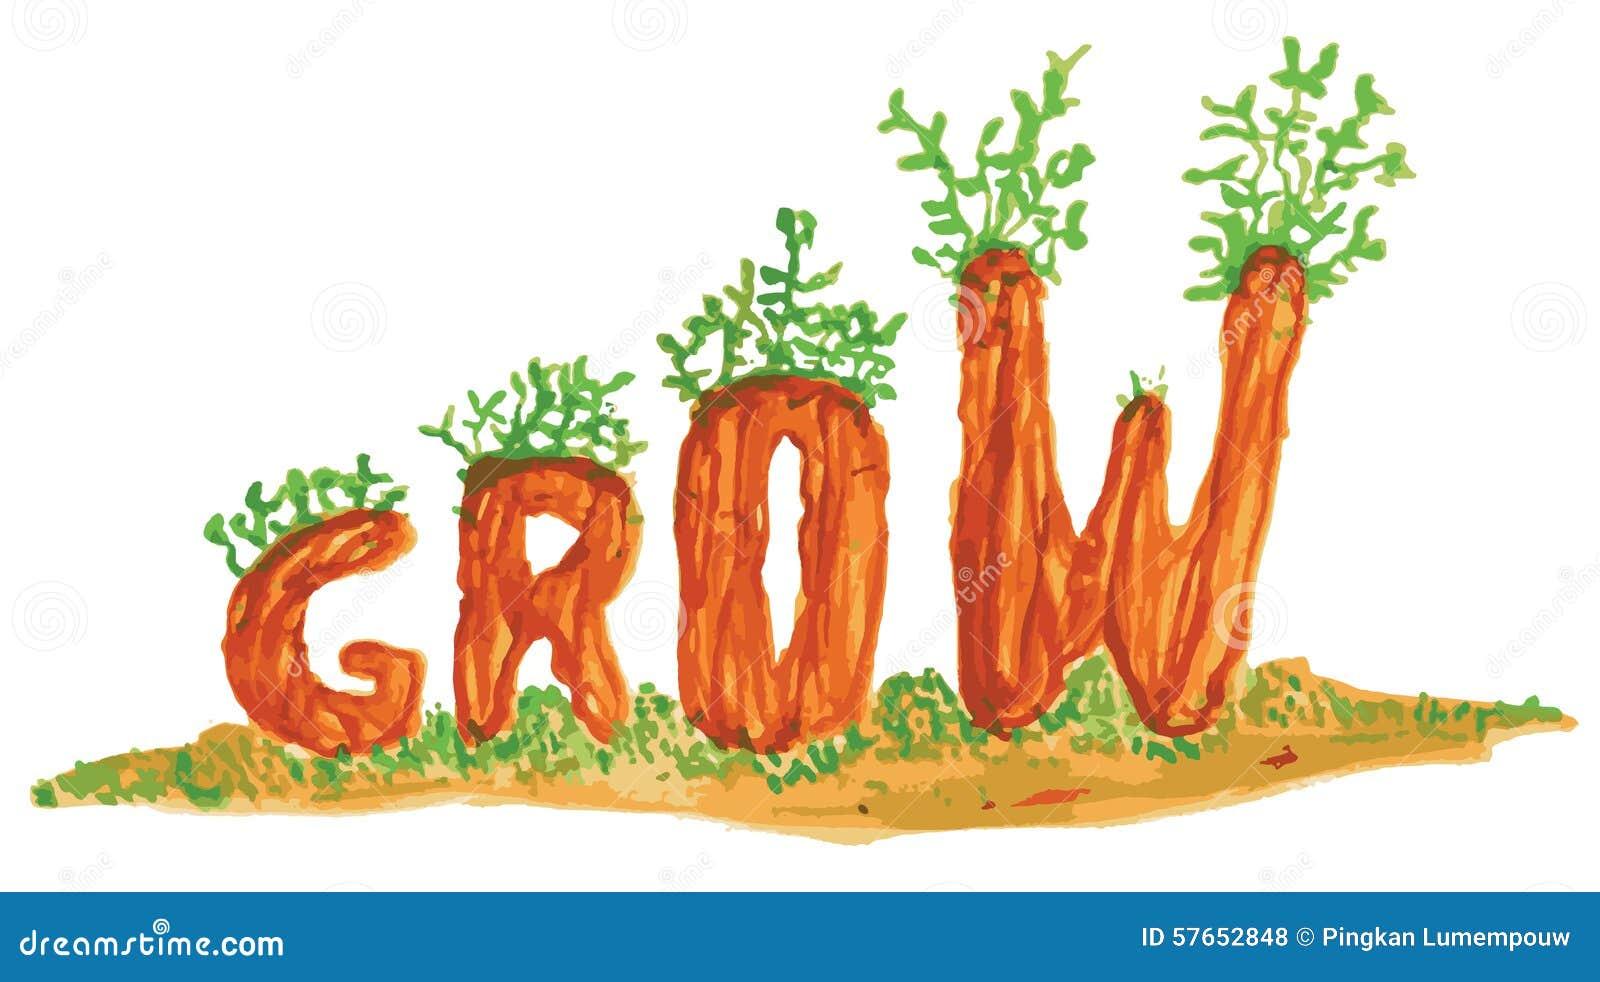 Draw A Plan Grow Word Art Stock Illustration Image 57652848